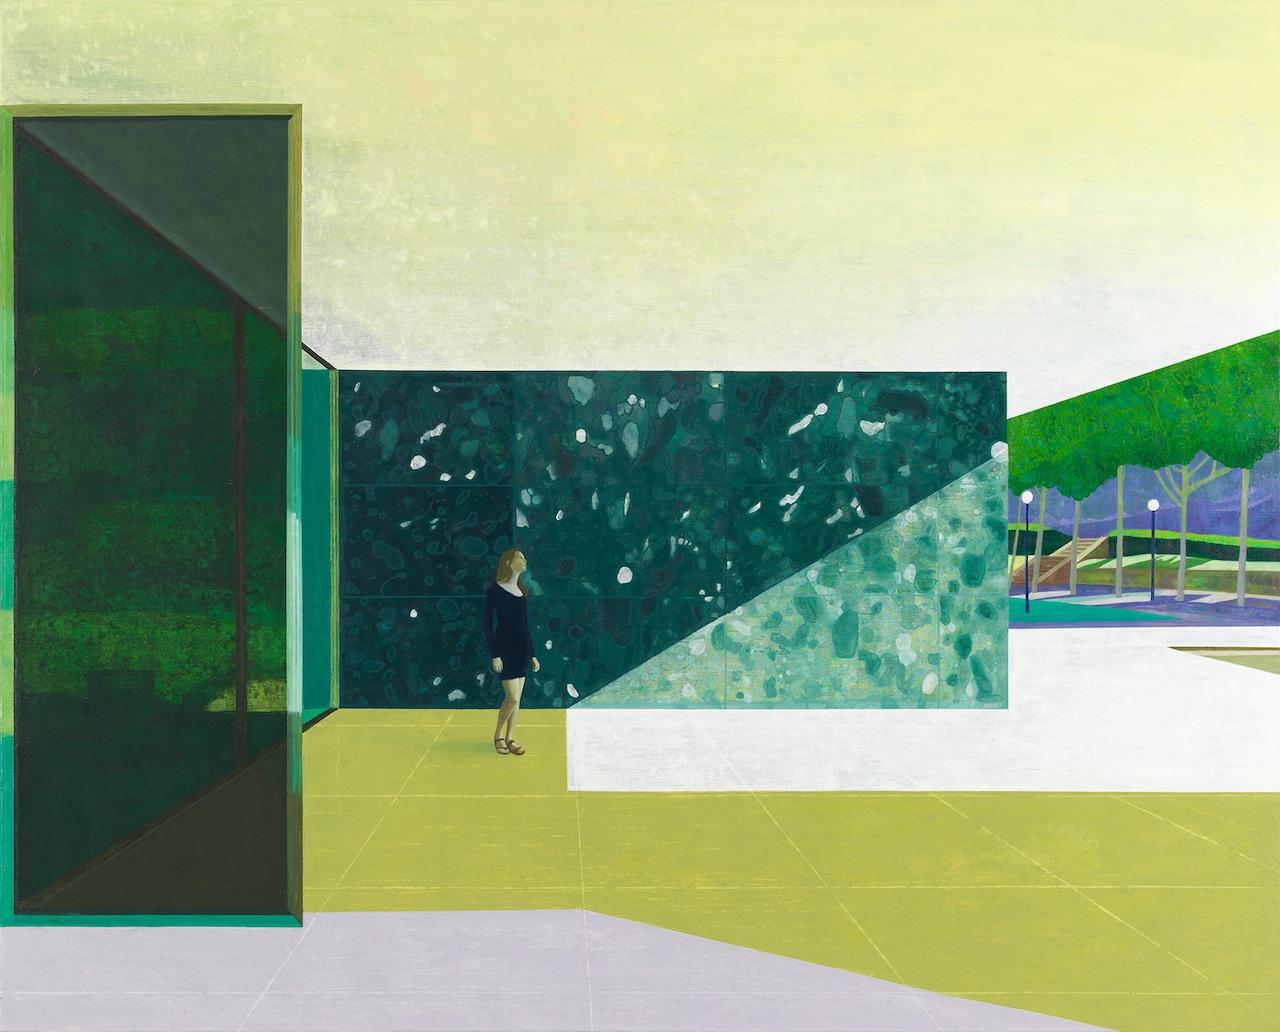 Hans Vandekerckhove / Laura Maria Barcelona / Litho on 310 g paper / 1 out of 8 / 75 x 60 cm framed